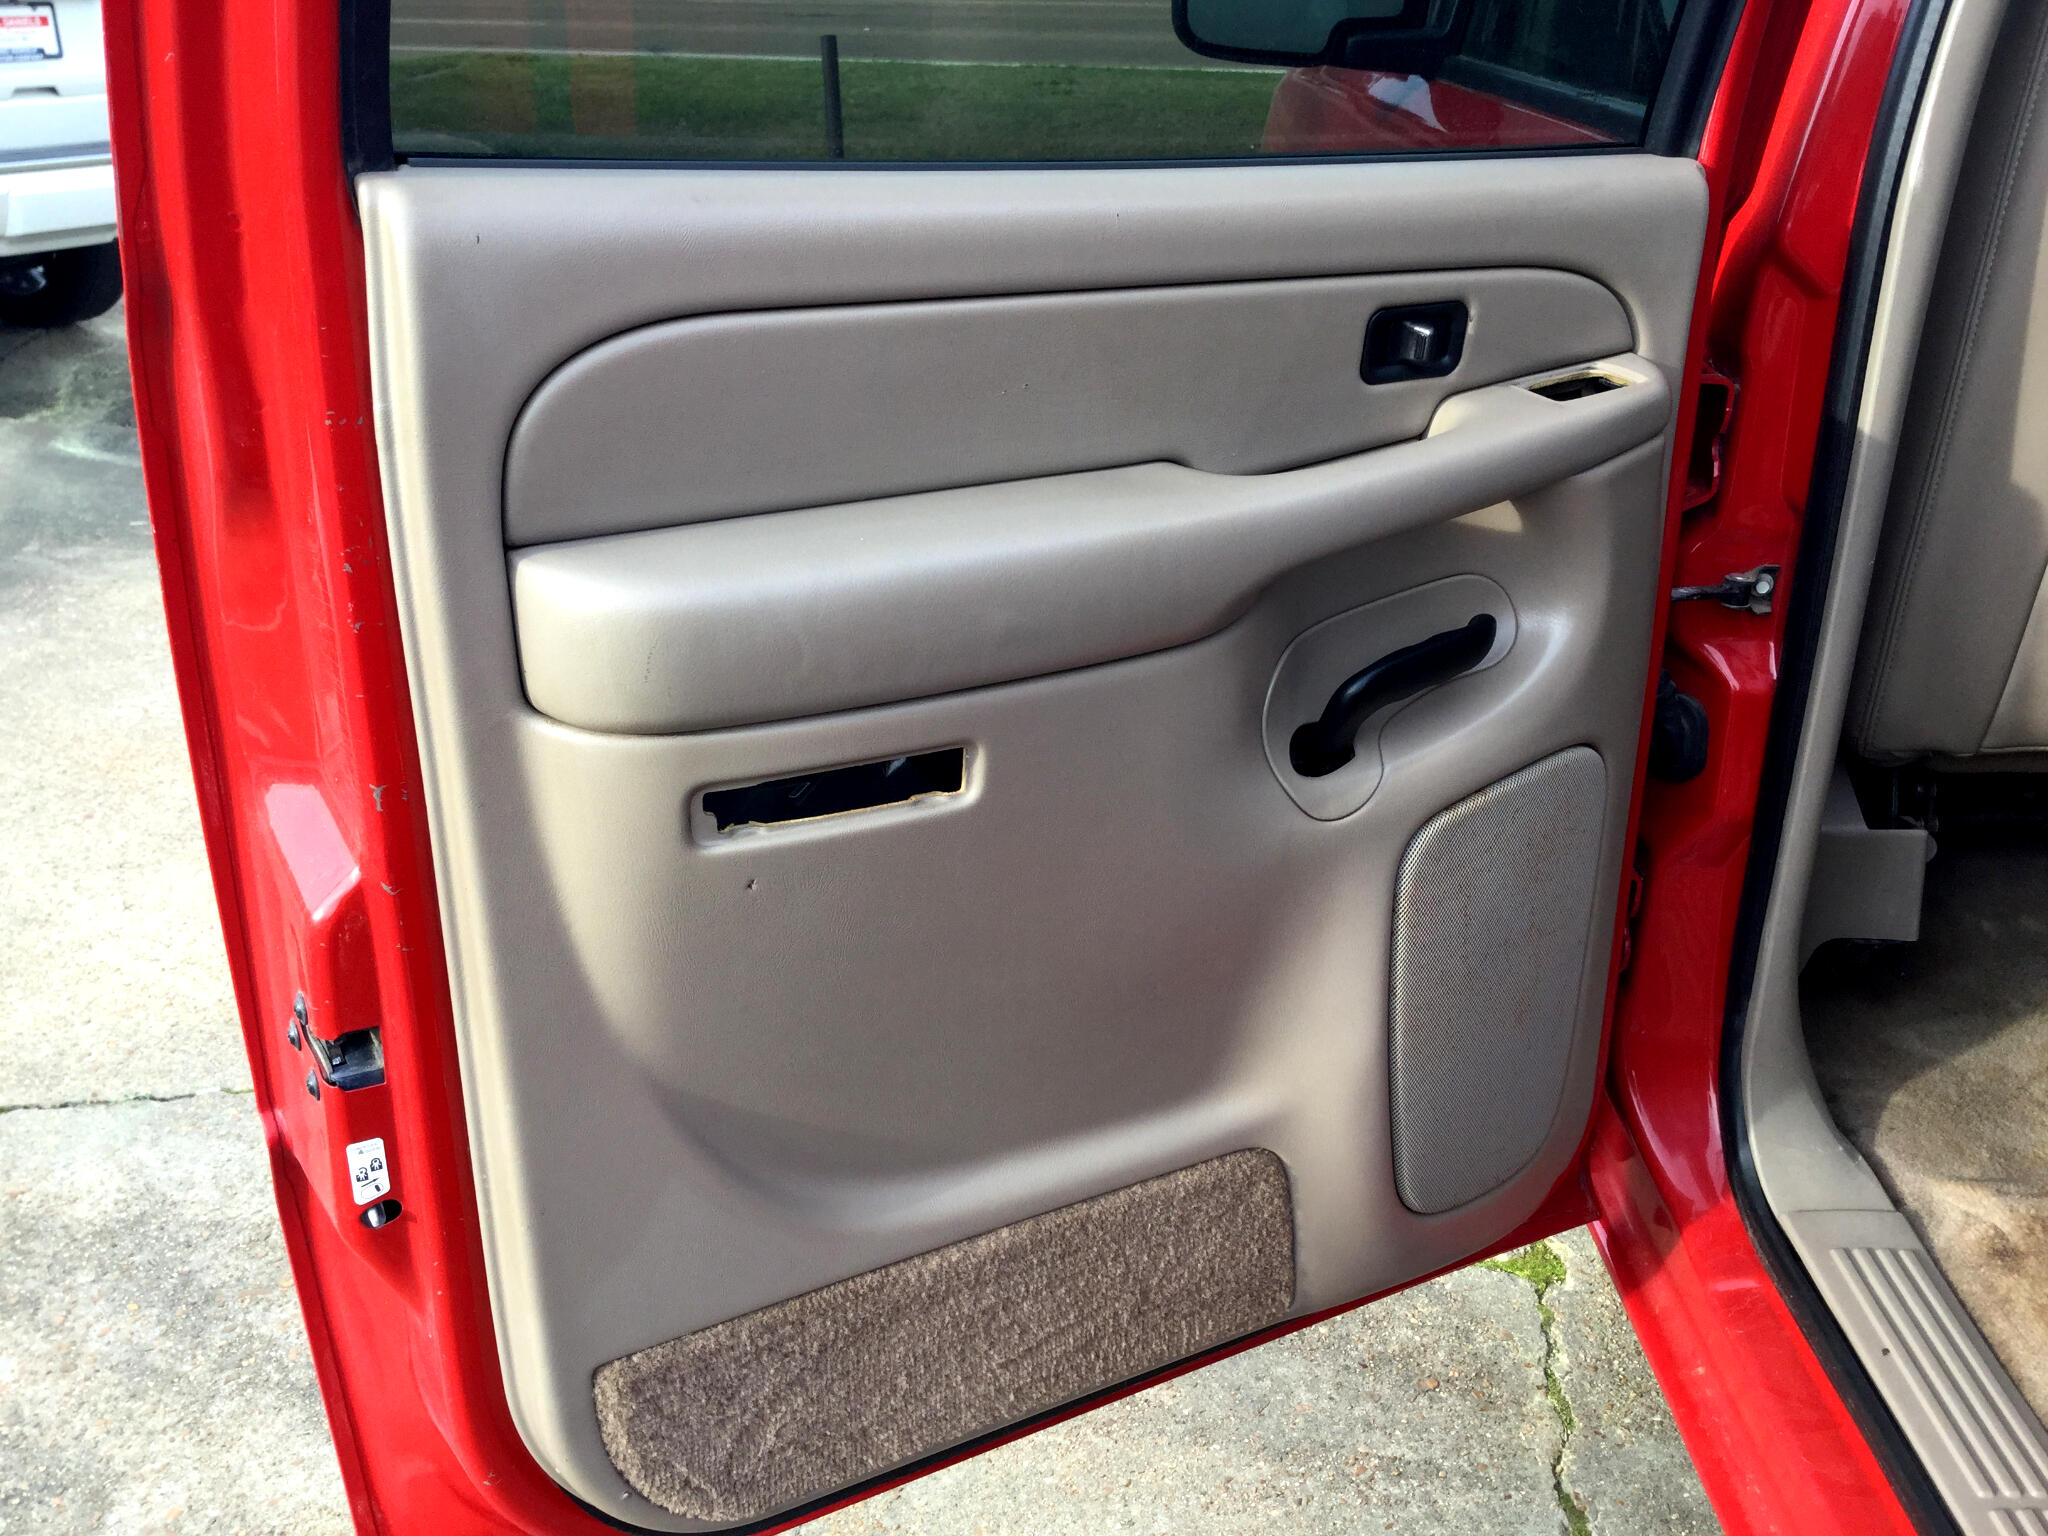 2005 Chevrolet Silverado 1500 Z71 Crew Cab 4WD 5.3l V8